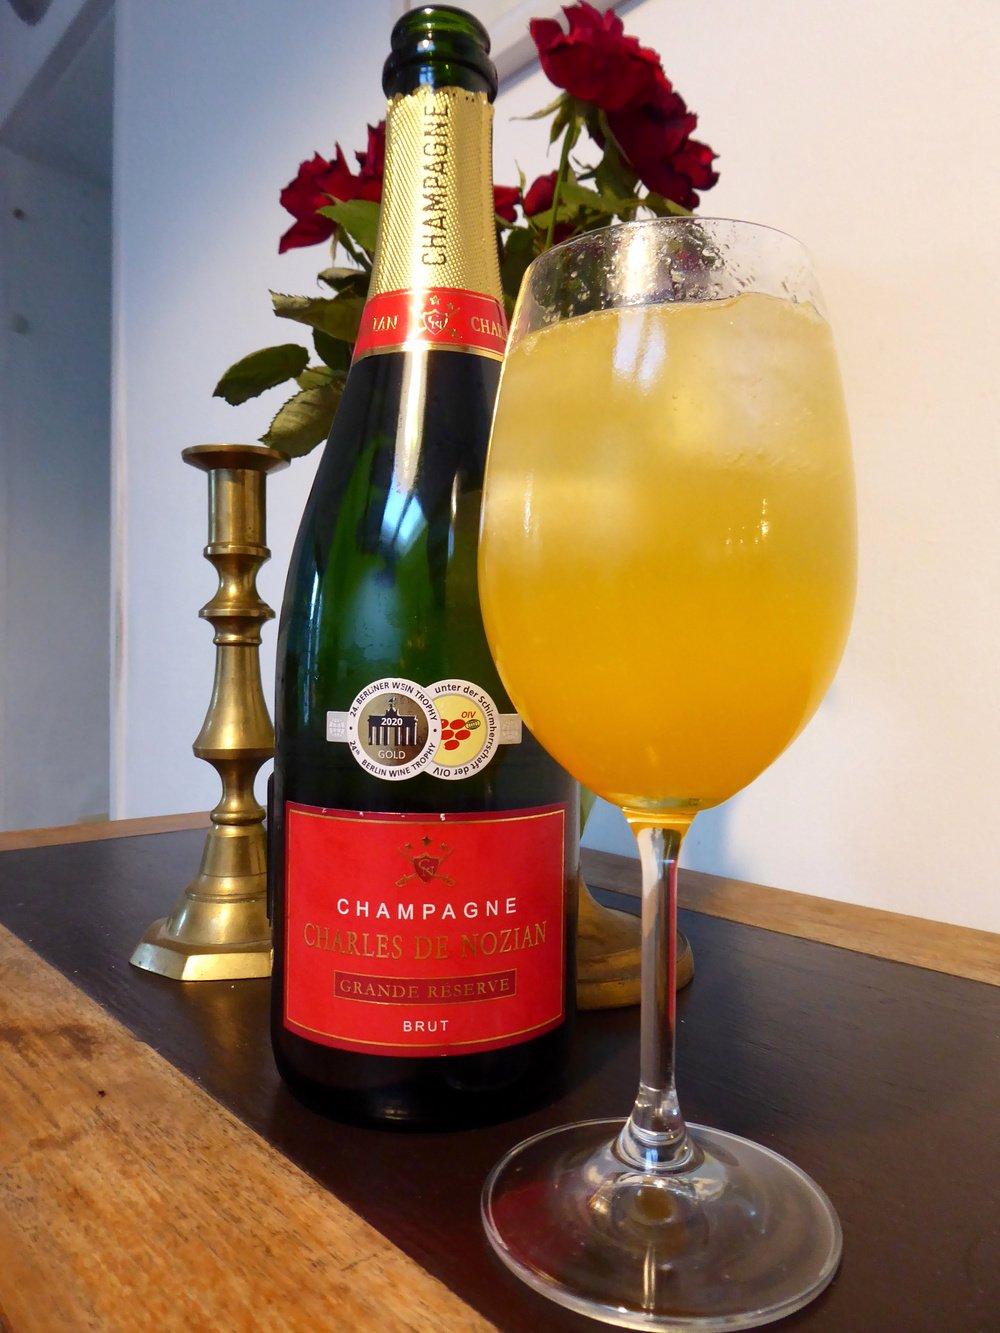 Netto Champagner Charles de Nozian Brut als Punch Romaine